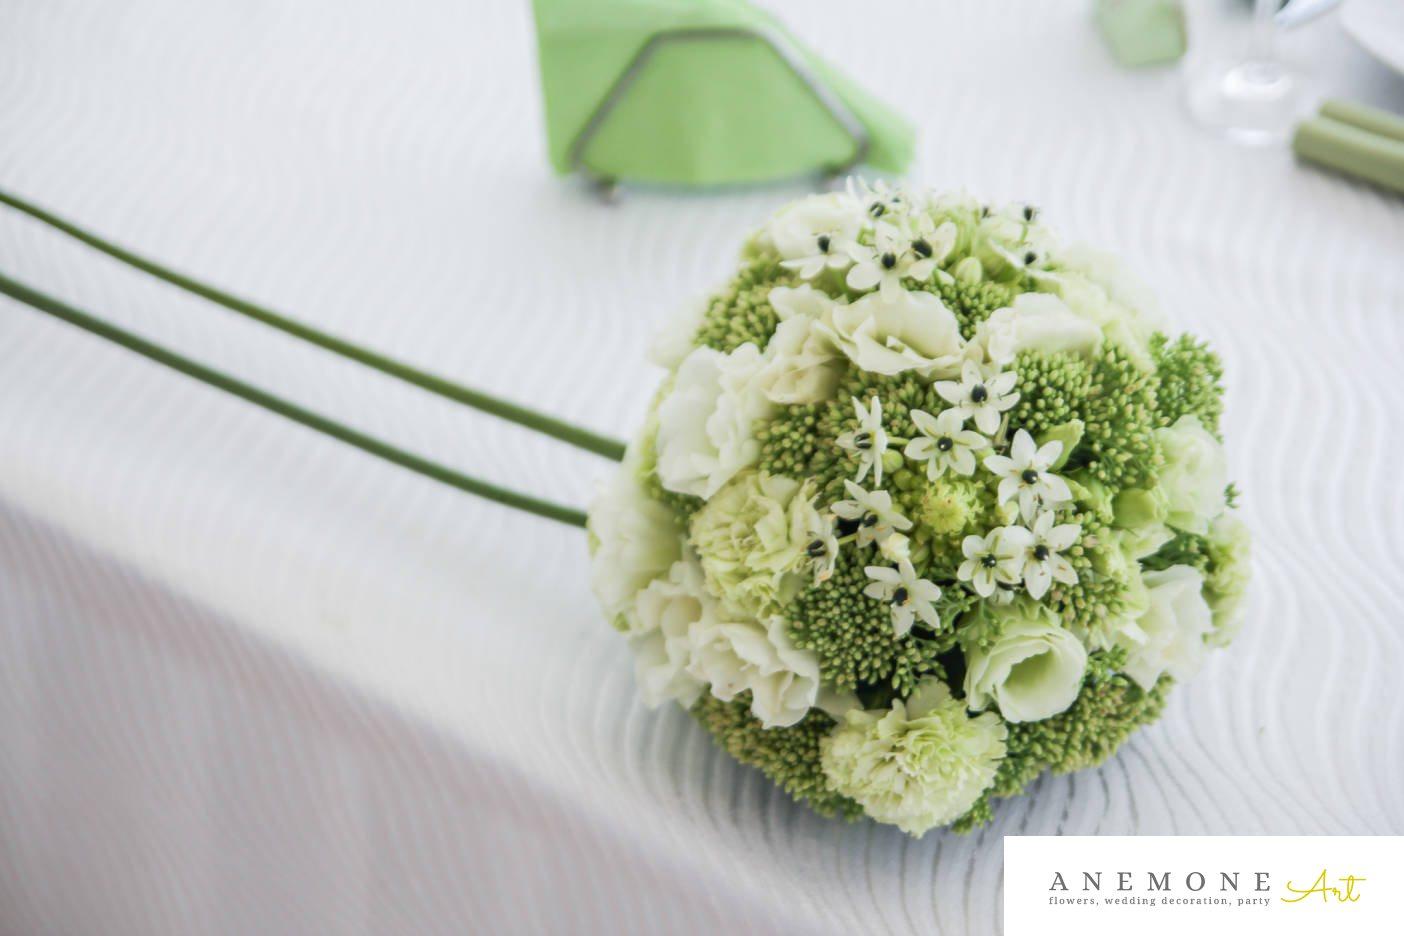 Poza, foto cu Flori de nunta alb, decor masa, garoafe, lisianthus, ornitogallum, sebum, trandafiri, verde, verdealb in Arad, Timisoara, Oradea (wedding flowers, bouquets) nunta Arad, Timisoara, Oradea